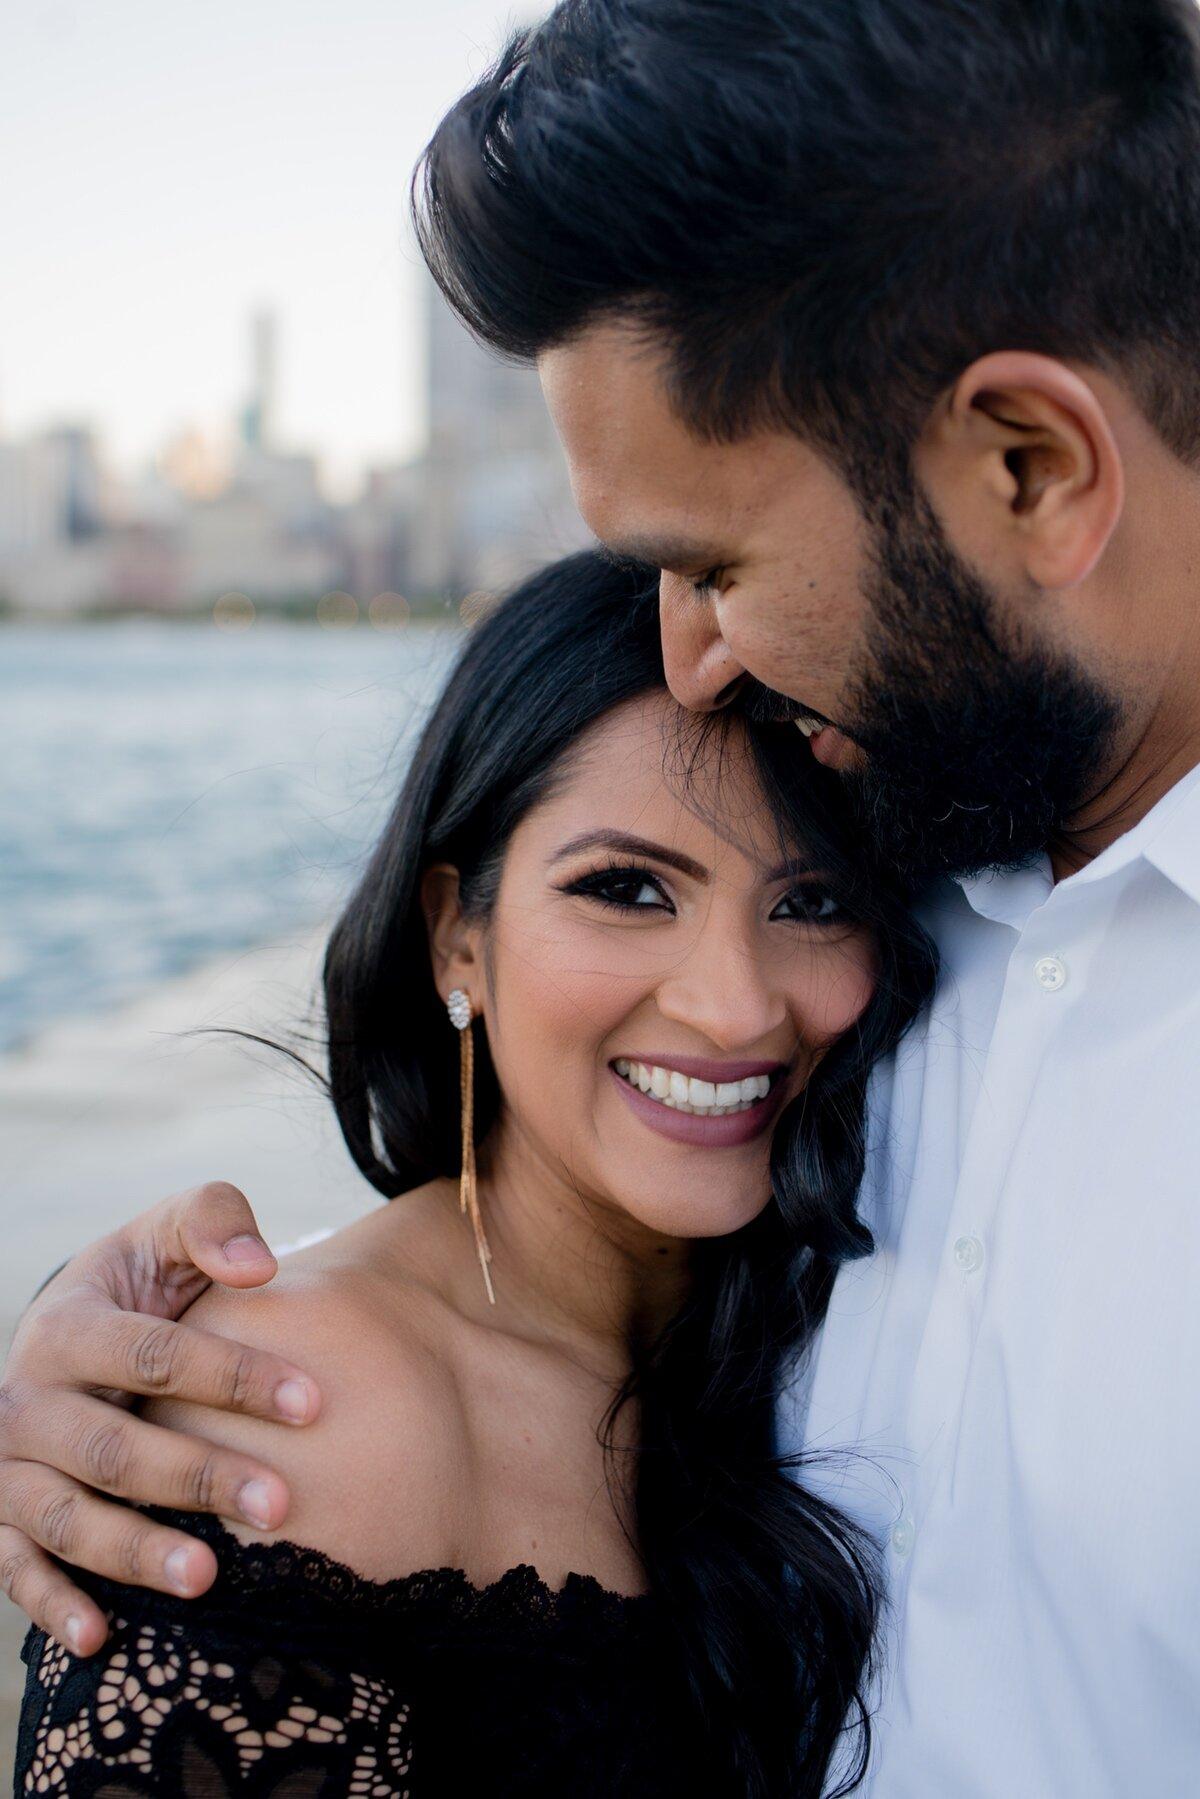 Le Cape Weddings - Chicago Engagement Session - Joann and Bensen -23.jpg